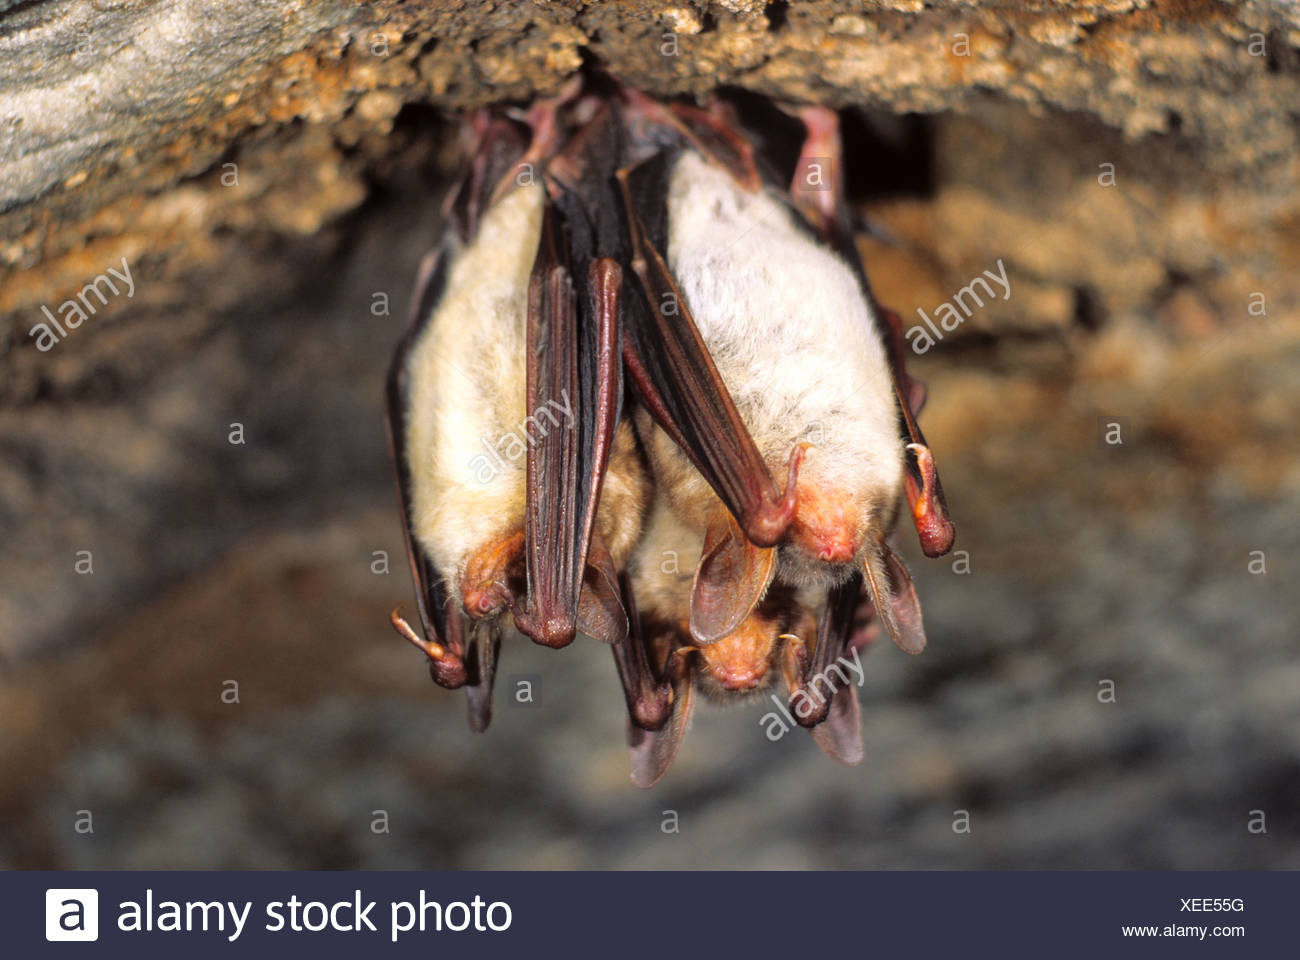 Greater Mouse-eared Bat (Myotis myotis) , hibernating in a cave - Stock Image